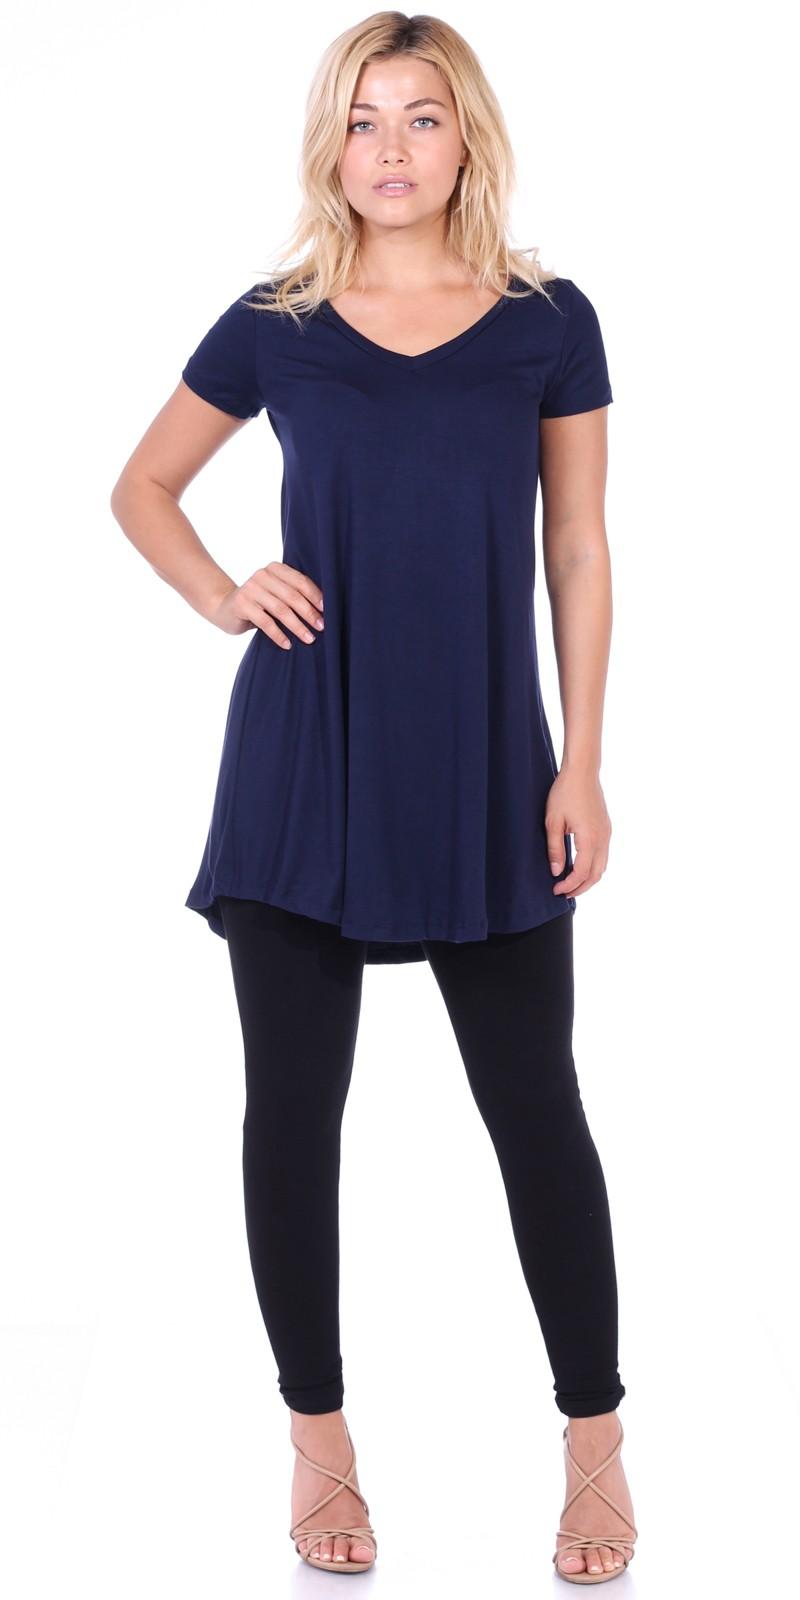 Navy Blue Dress with Leggings